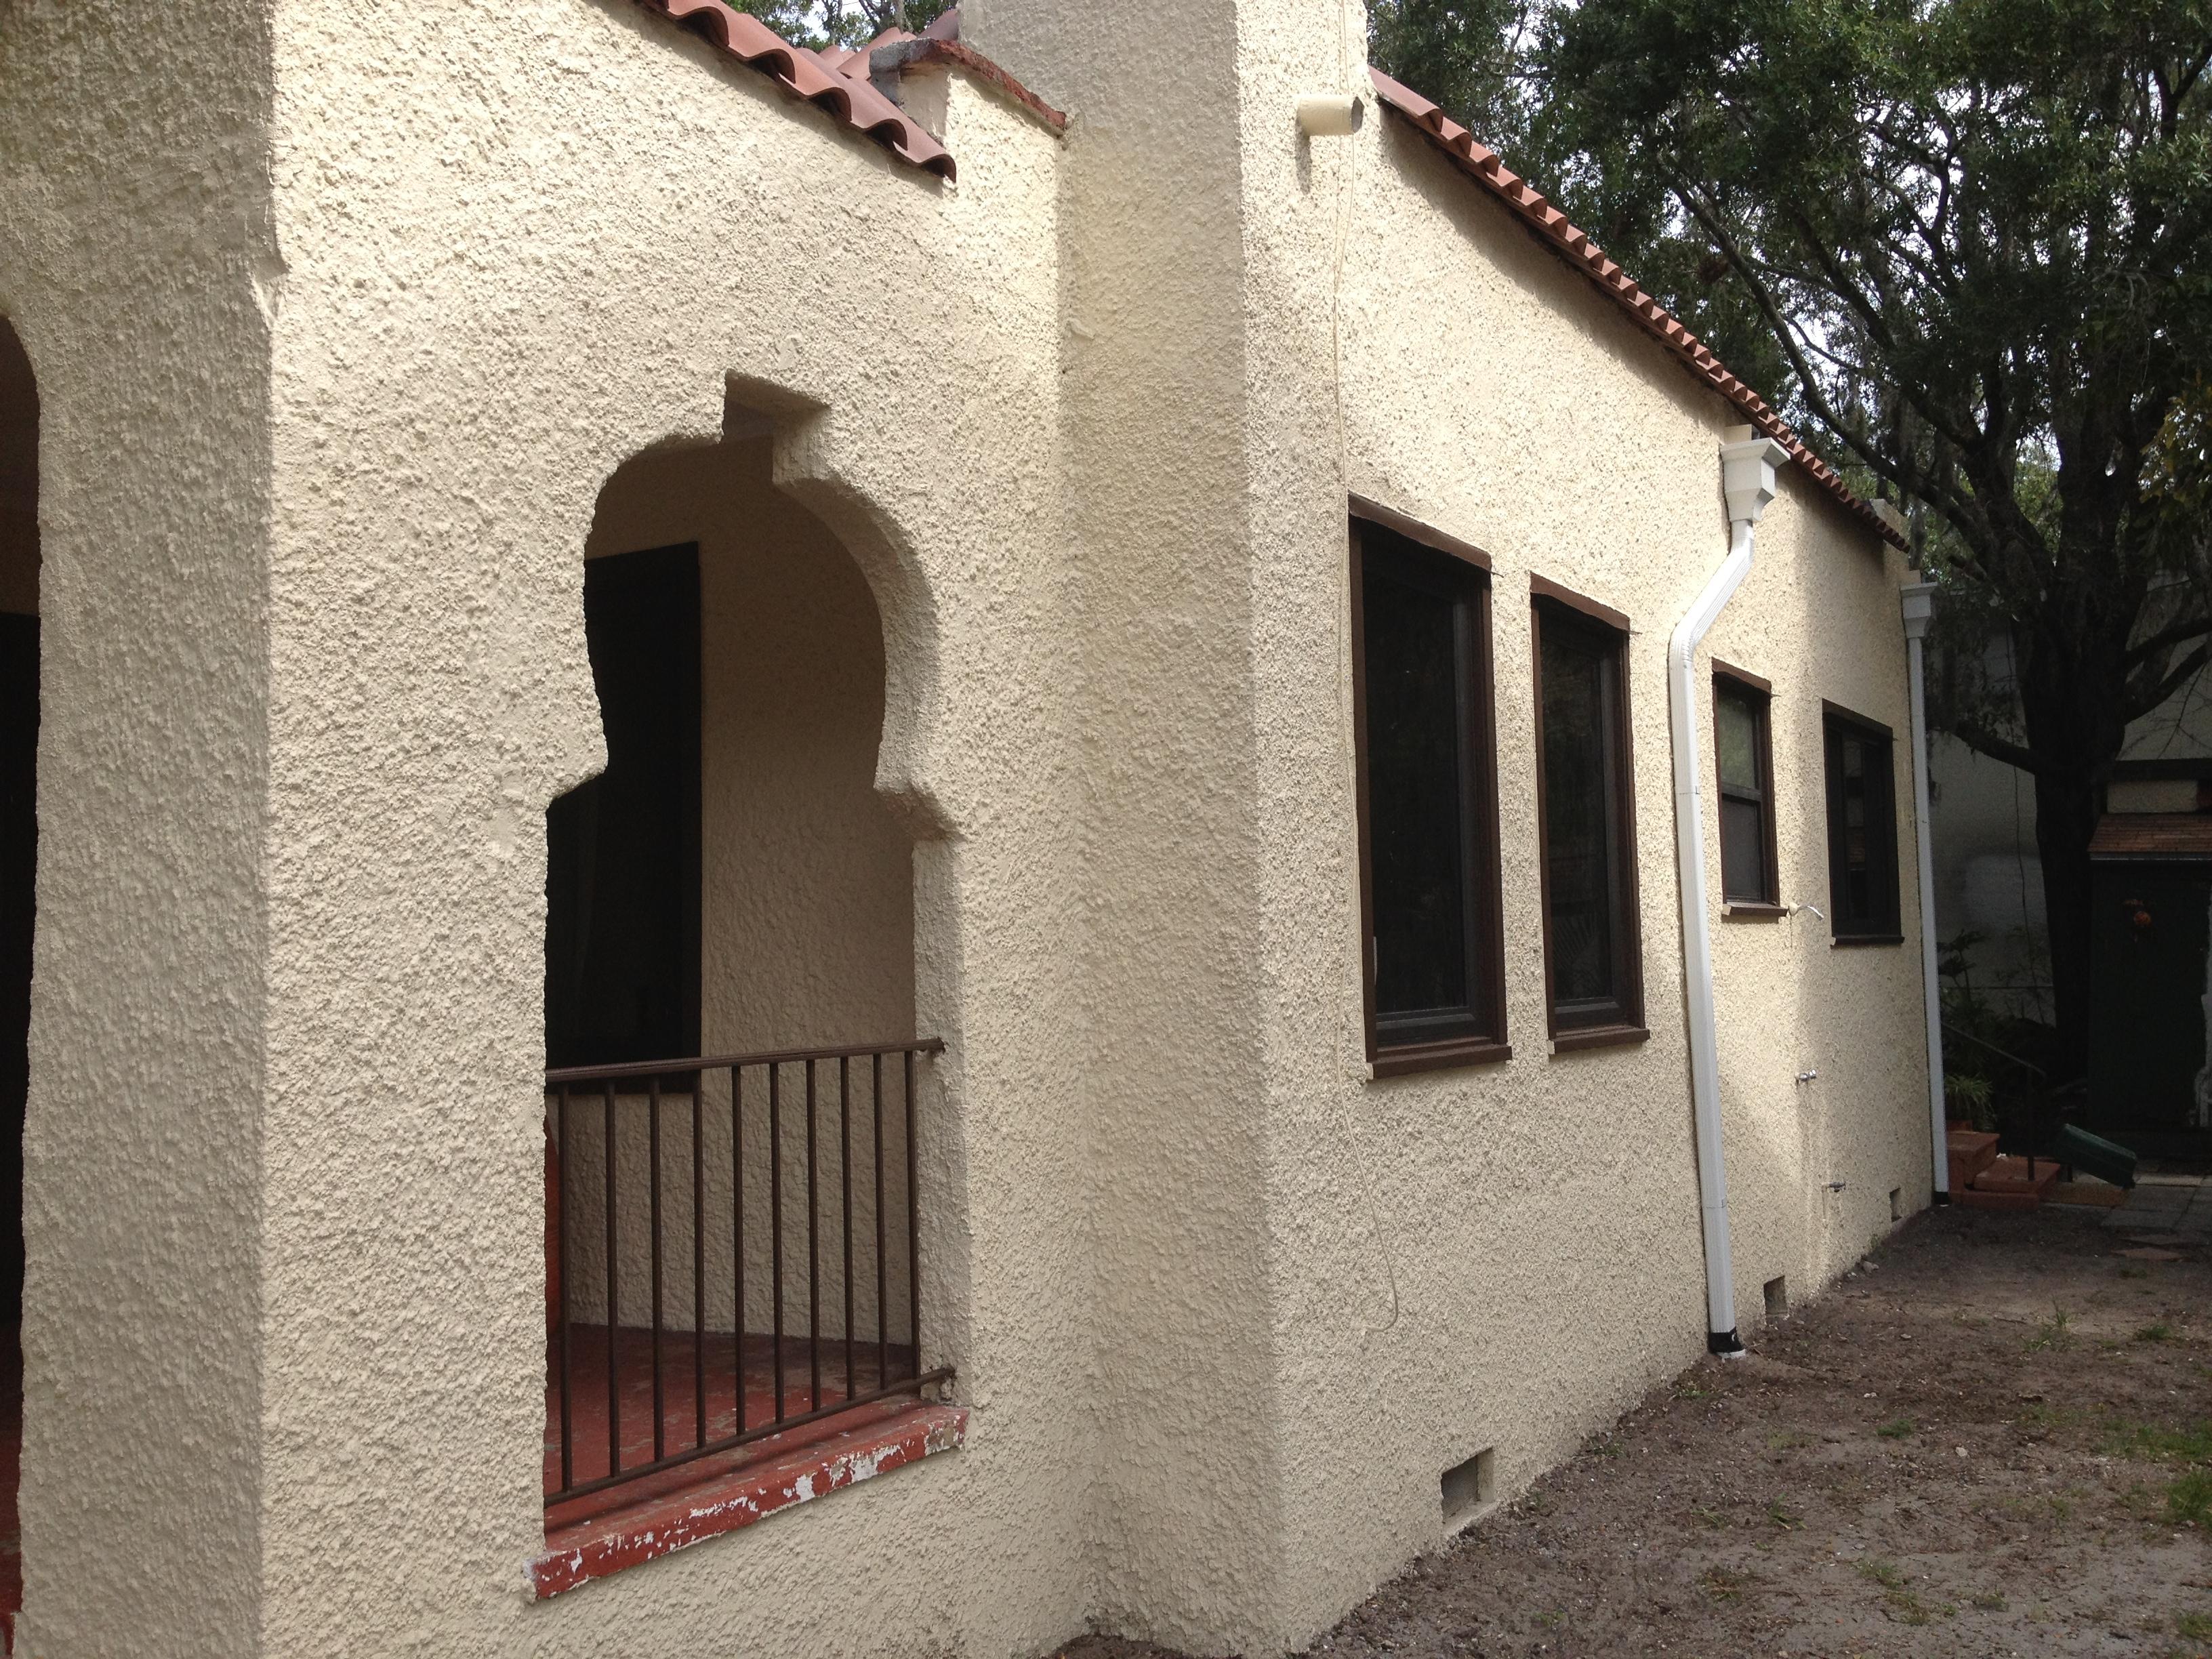 Joe Angeleri - 1925 historic home saved - AFTER